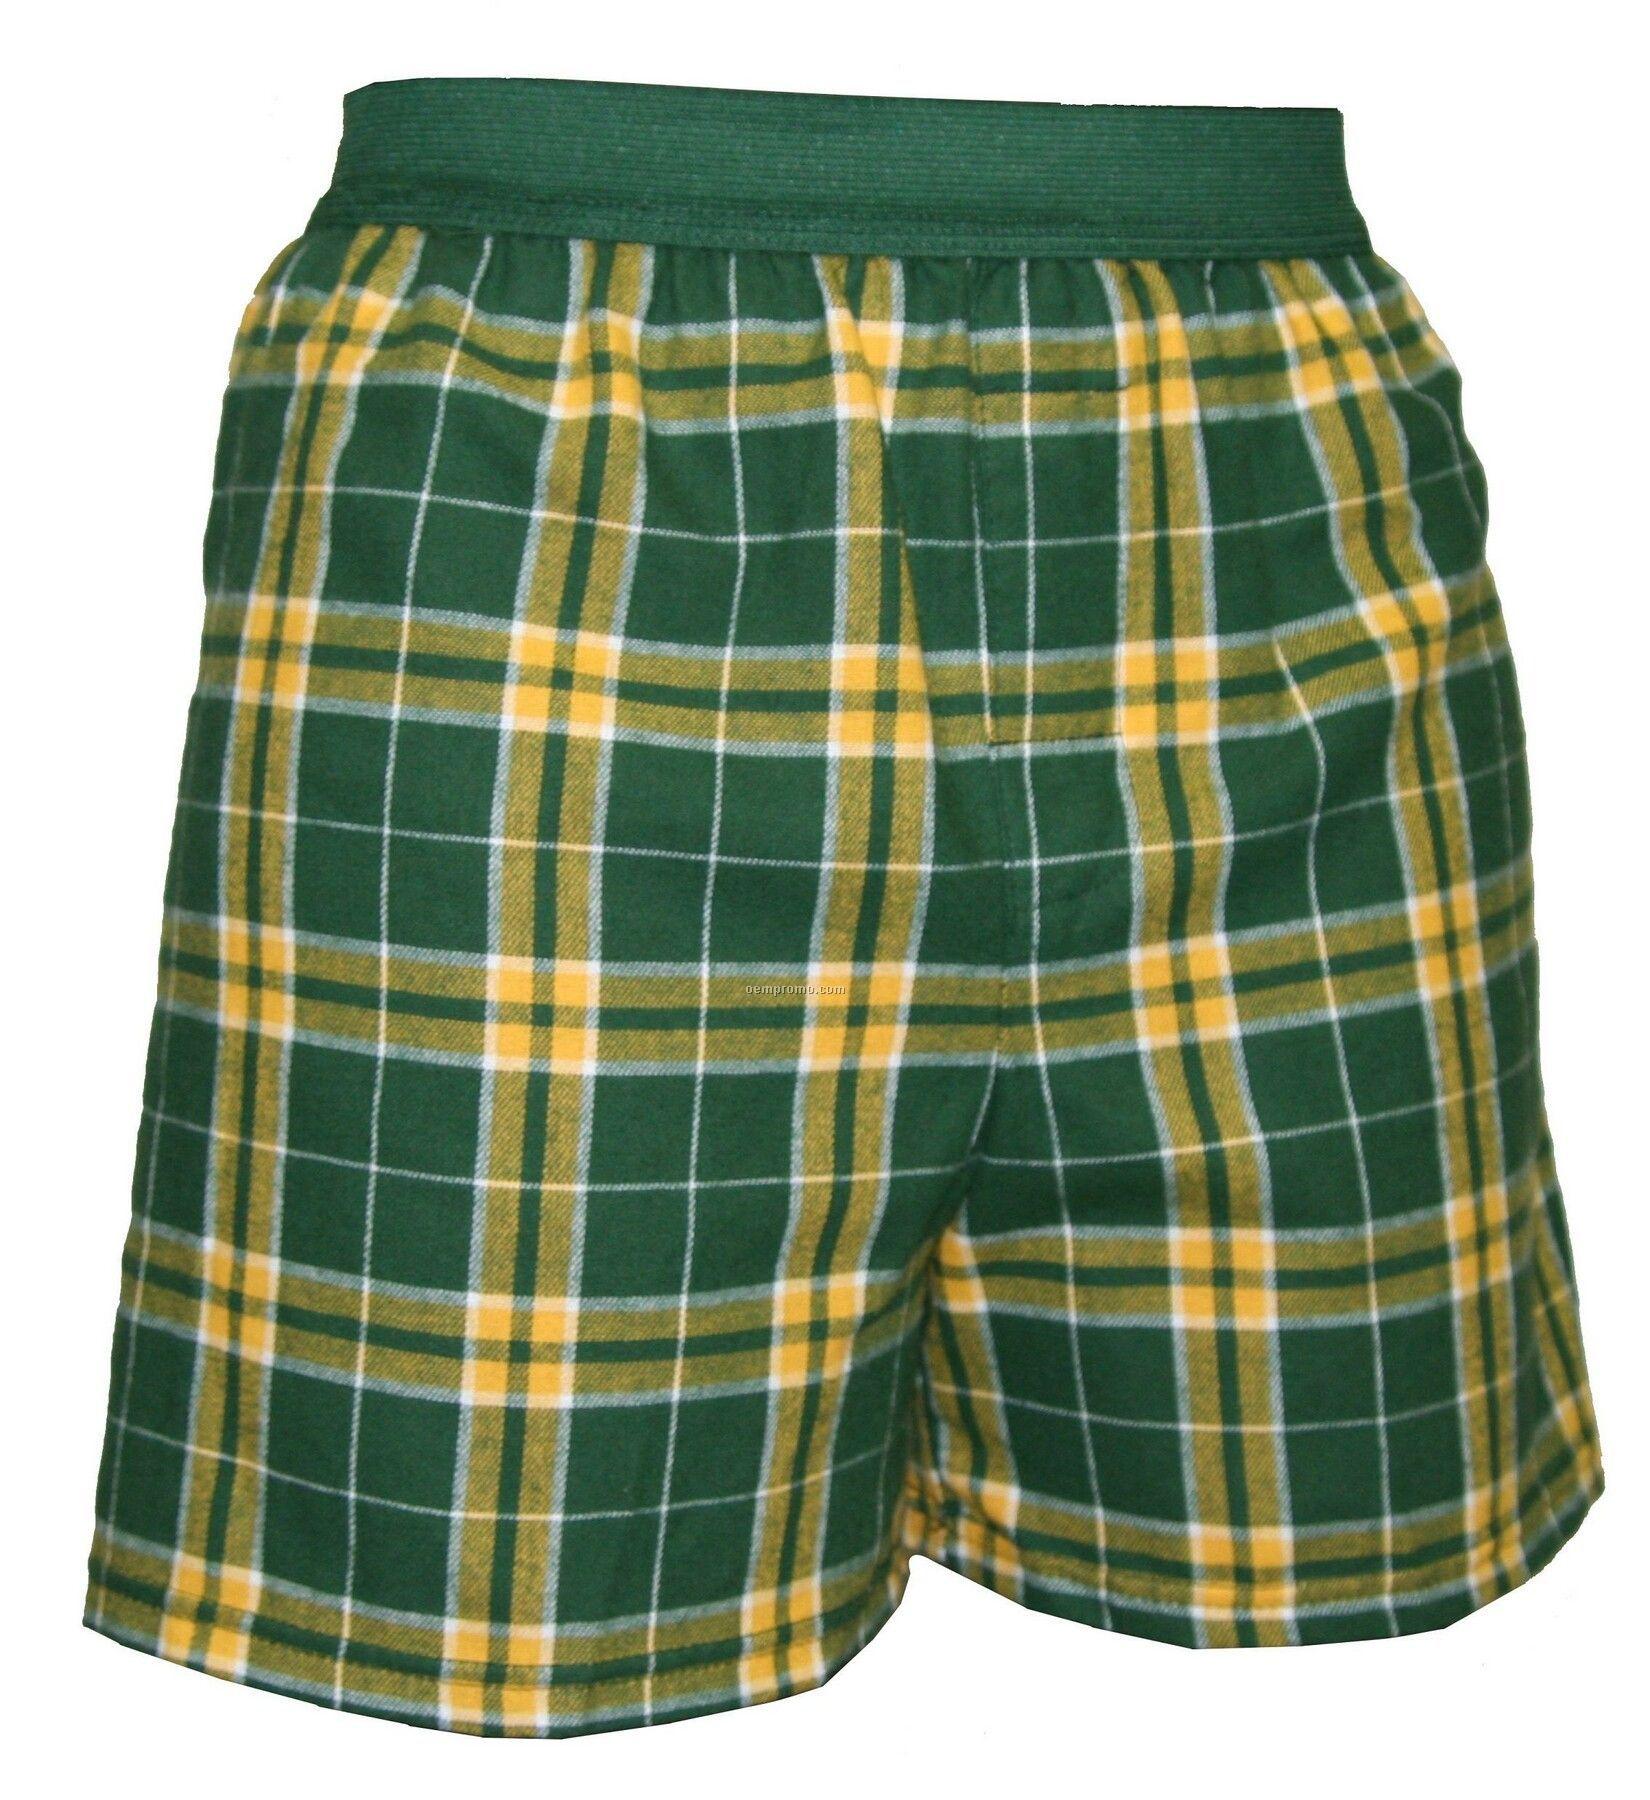 Adult Green/Gold Plaid Classic Boxer Short